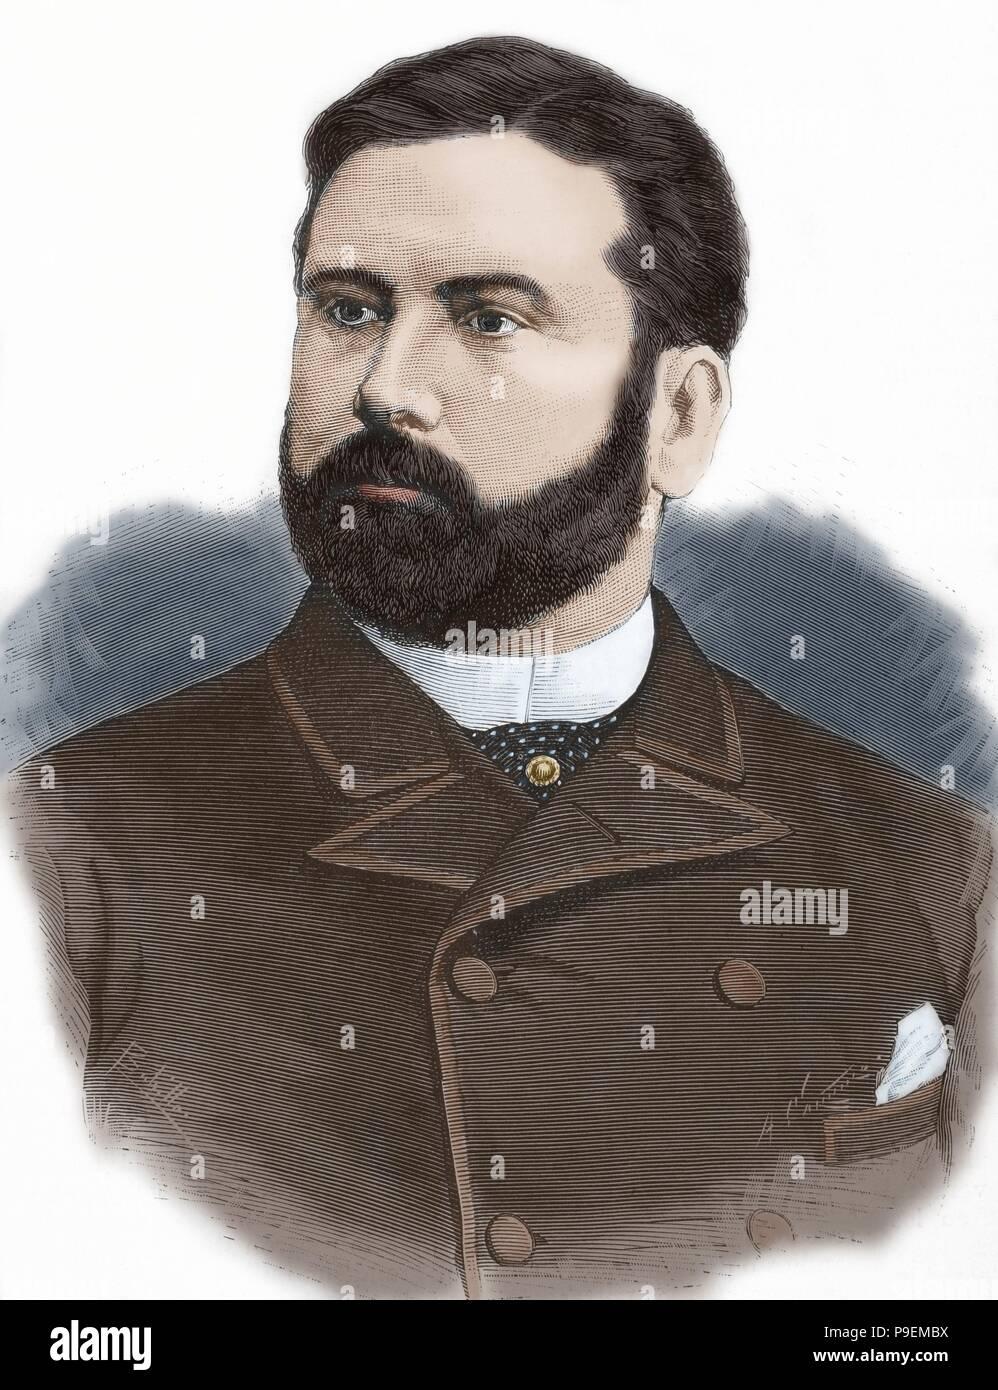 Raimundo Fernandez-Villaverde y Garcia del Rivero, jure uxoris Marquis of Pozo Rubio, (1848-1905). Spanish statesman. Portrait. Engraving by Arturo Carretero. 'La Ilustracion Espanola y Americana', 1884. Colored. - Stock Image